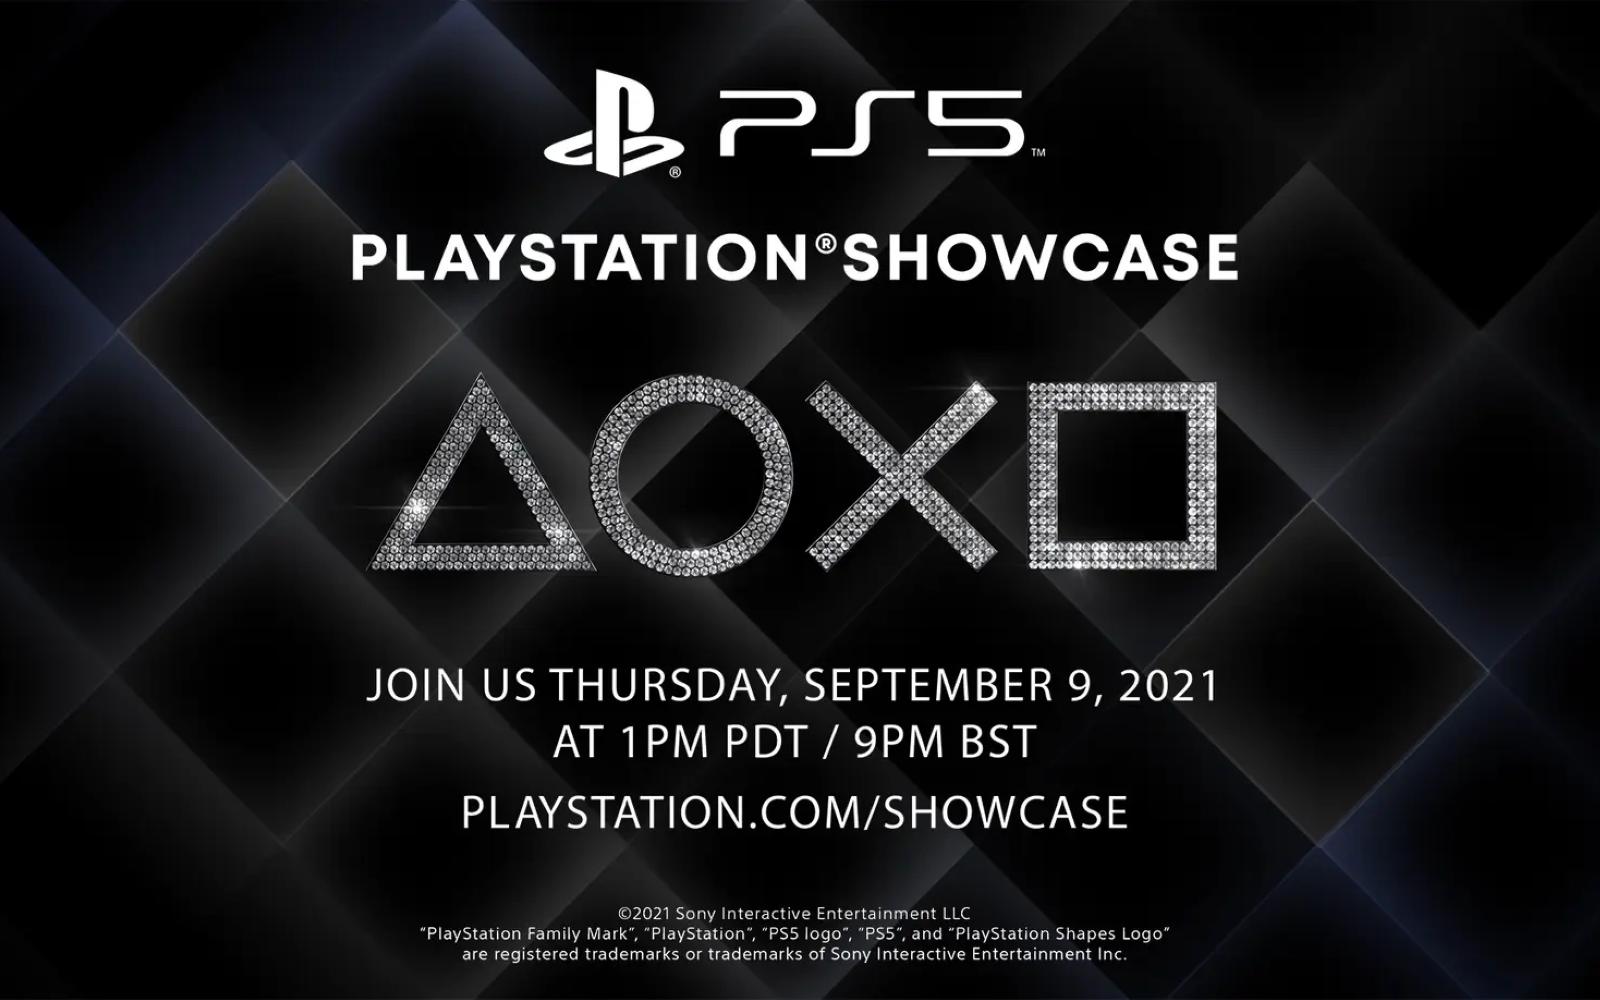 PlayStation Showcase Predictions